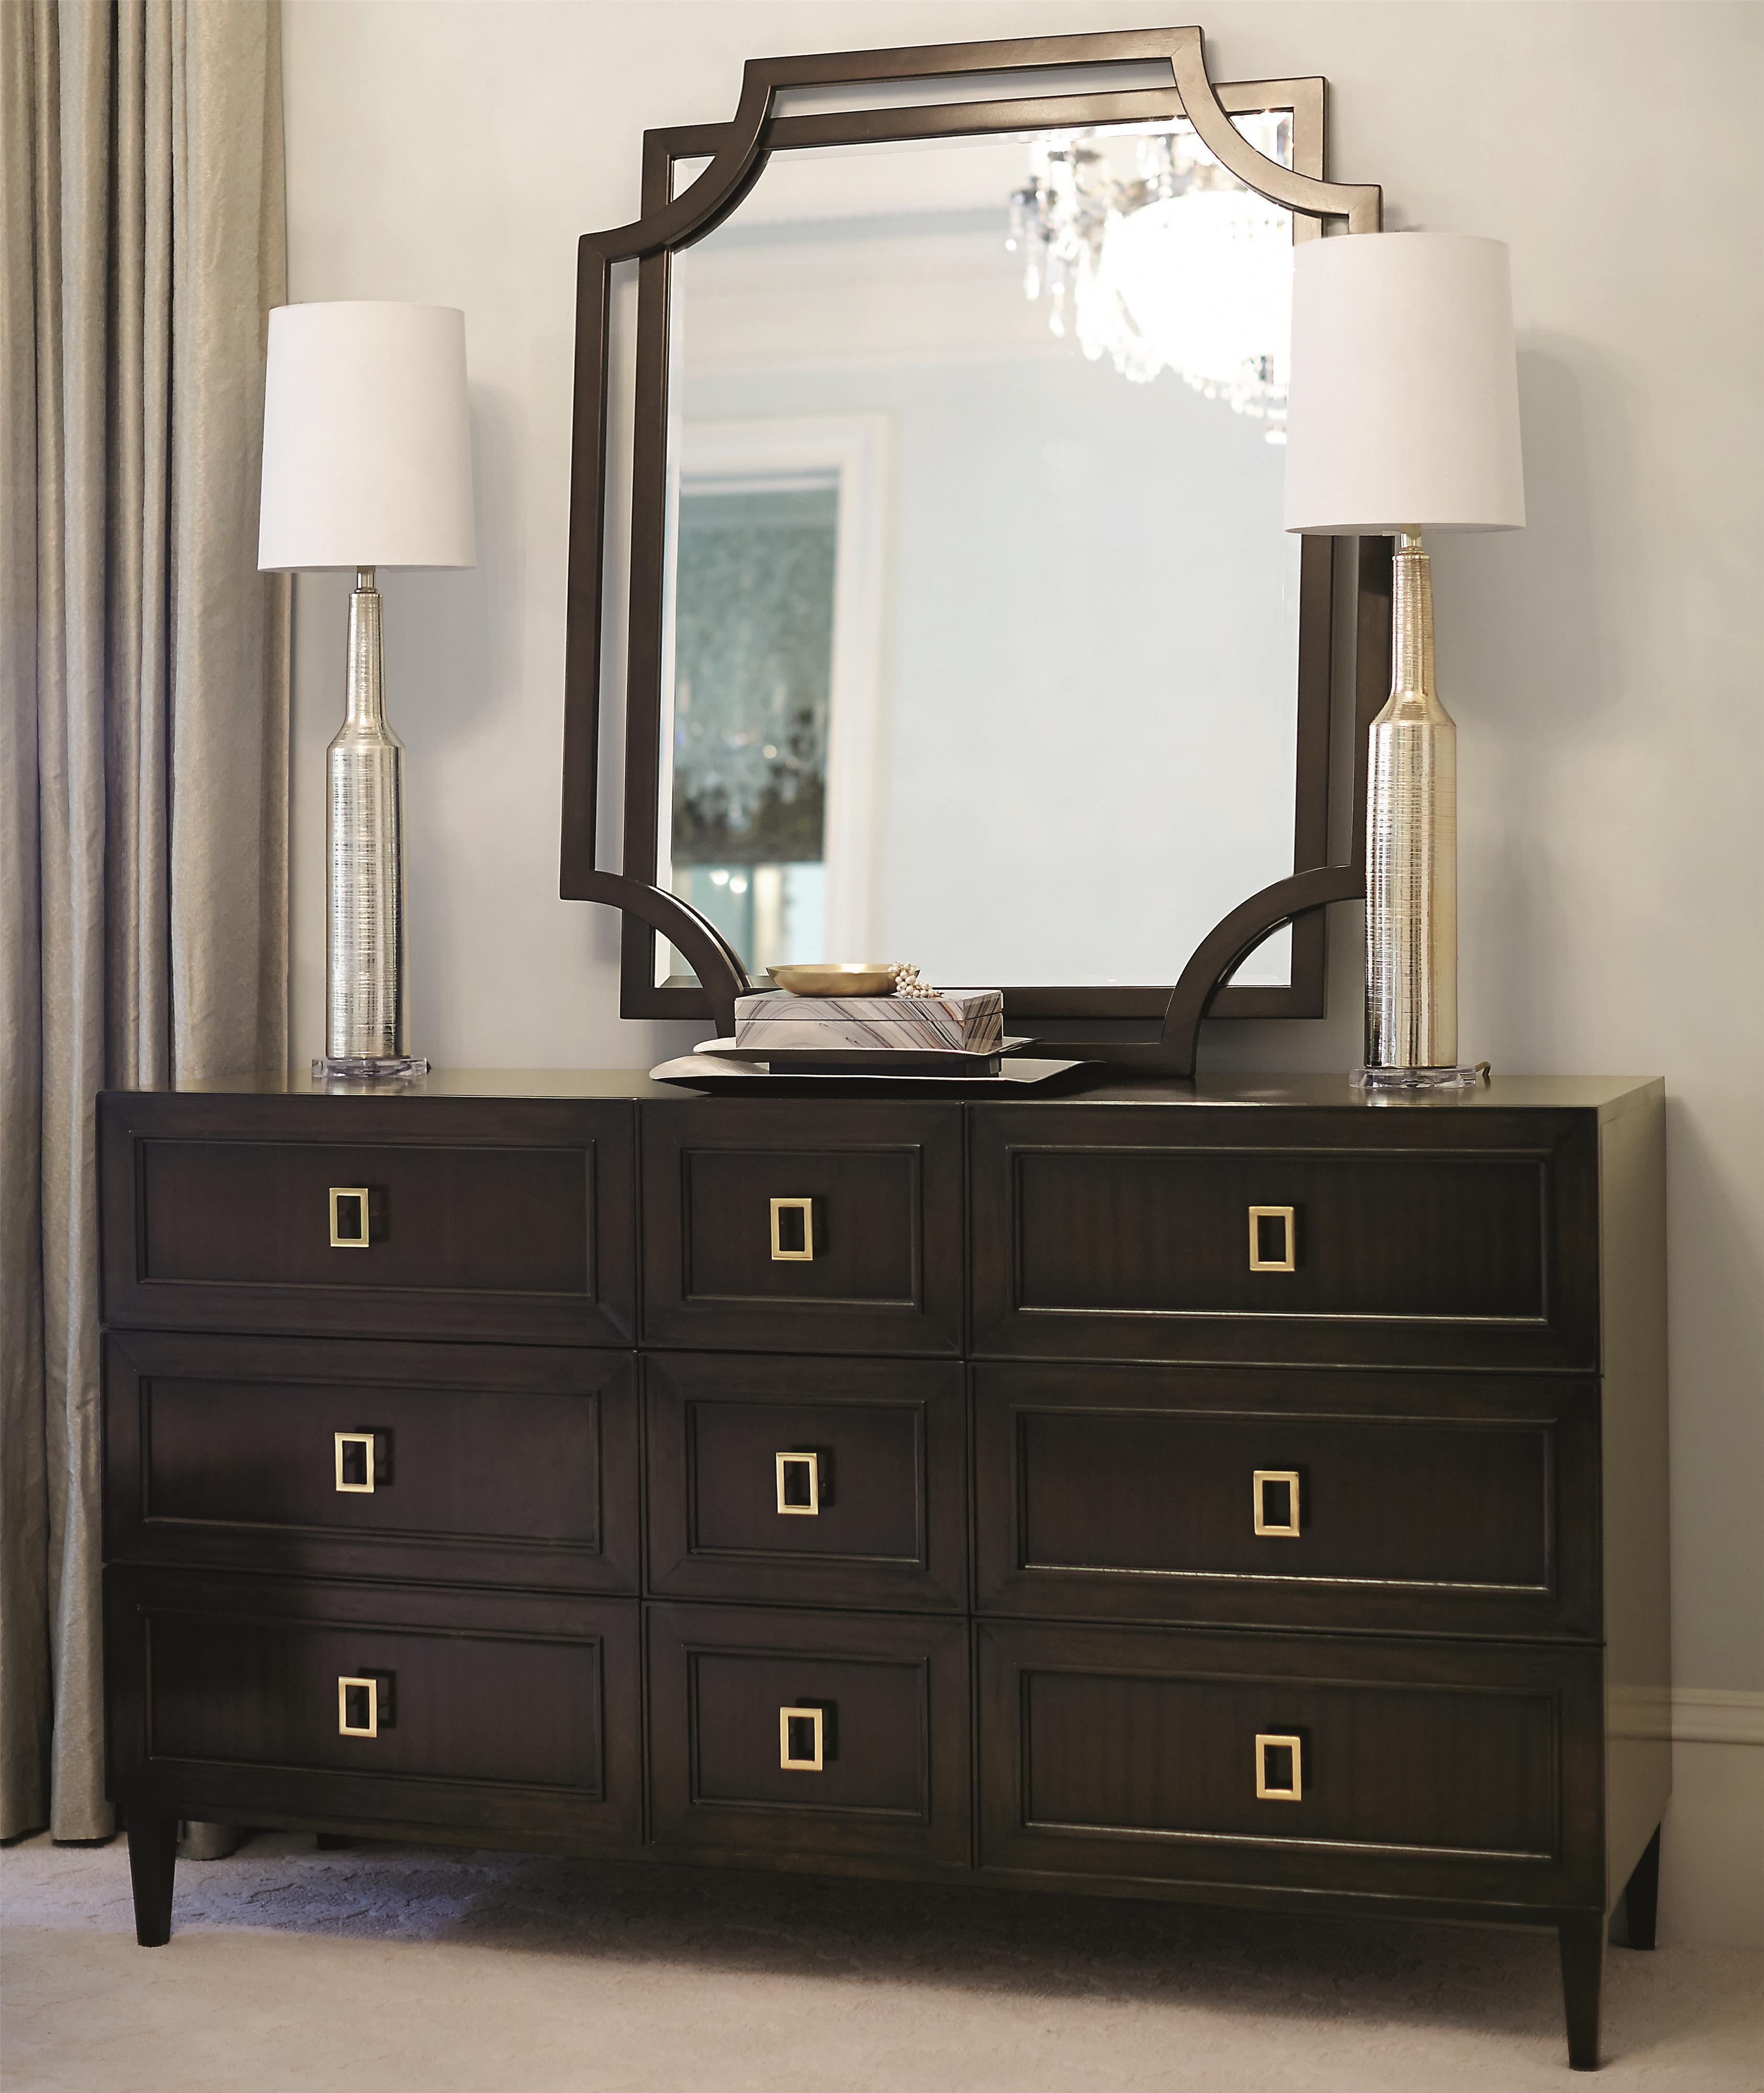 Bernhardt Jet Set Dresser and Mirror Set - Item Number: 356-053+321